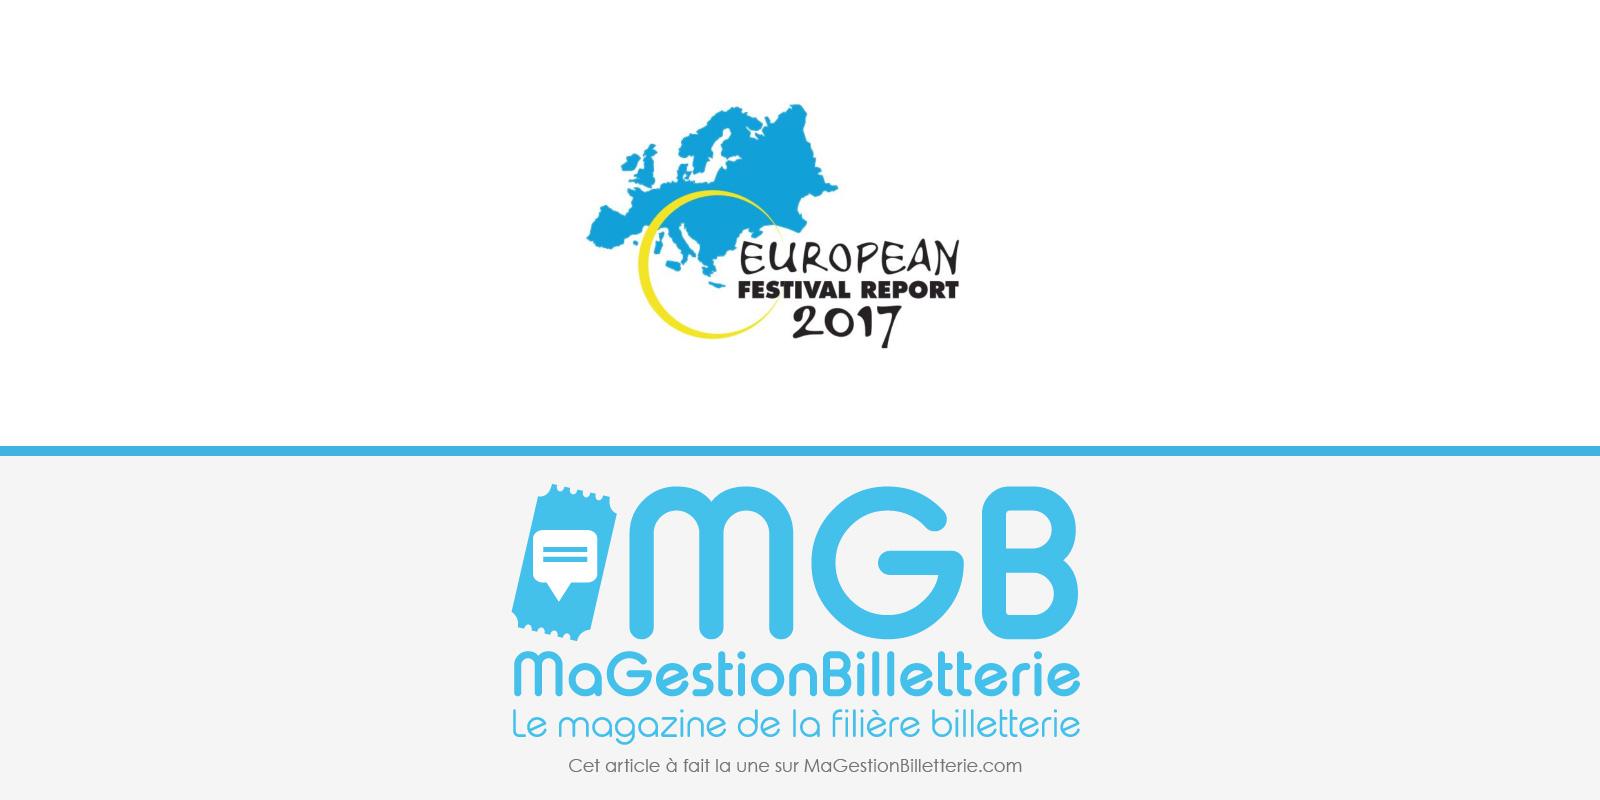 europeen-festival-report-2017-une